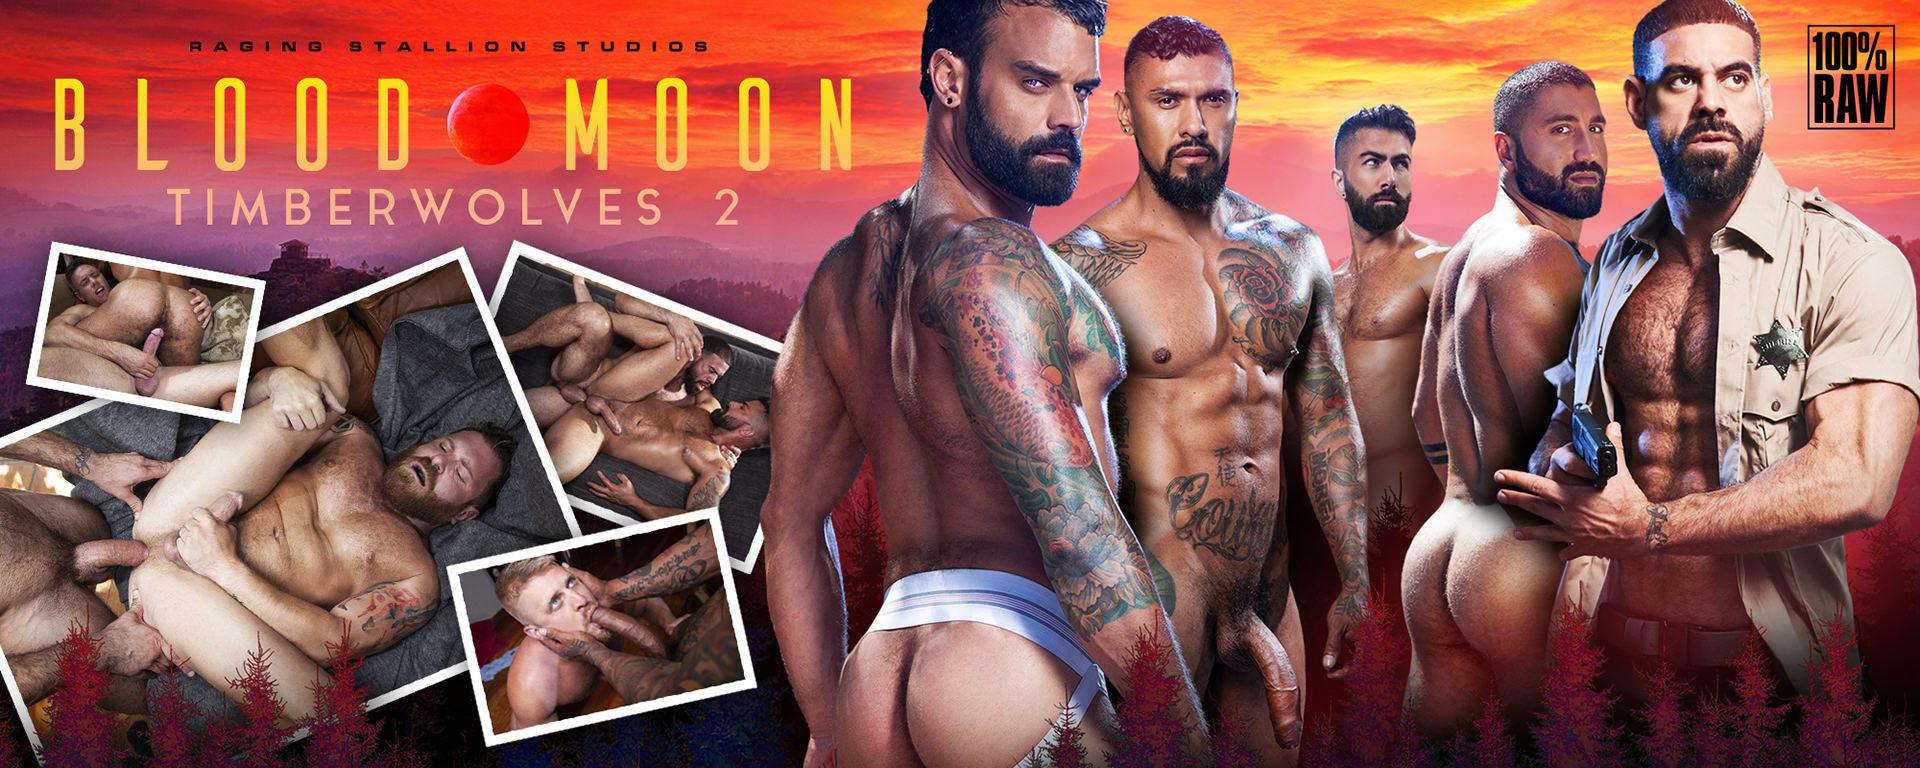 Raging Stallion Blood Moon: Timberwolves 2